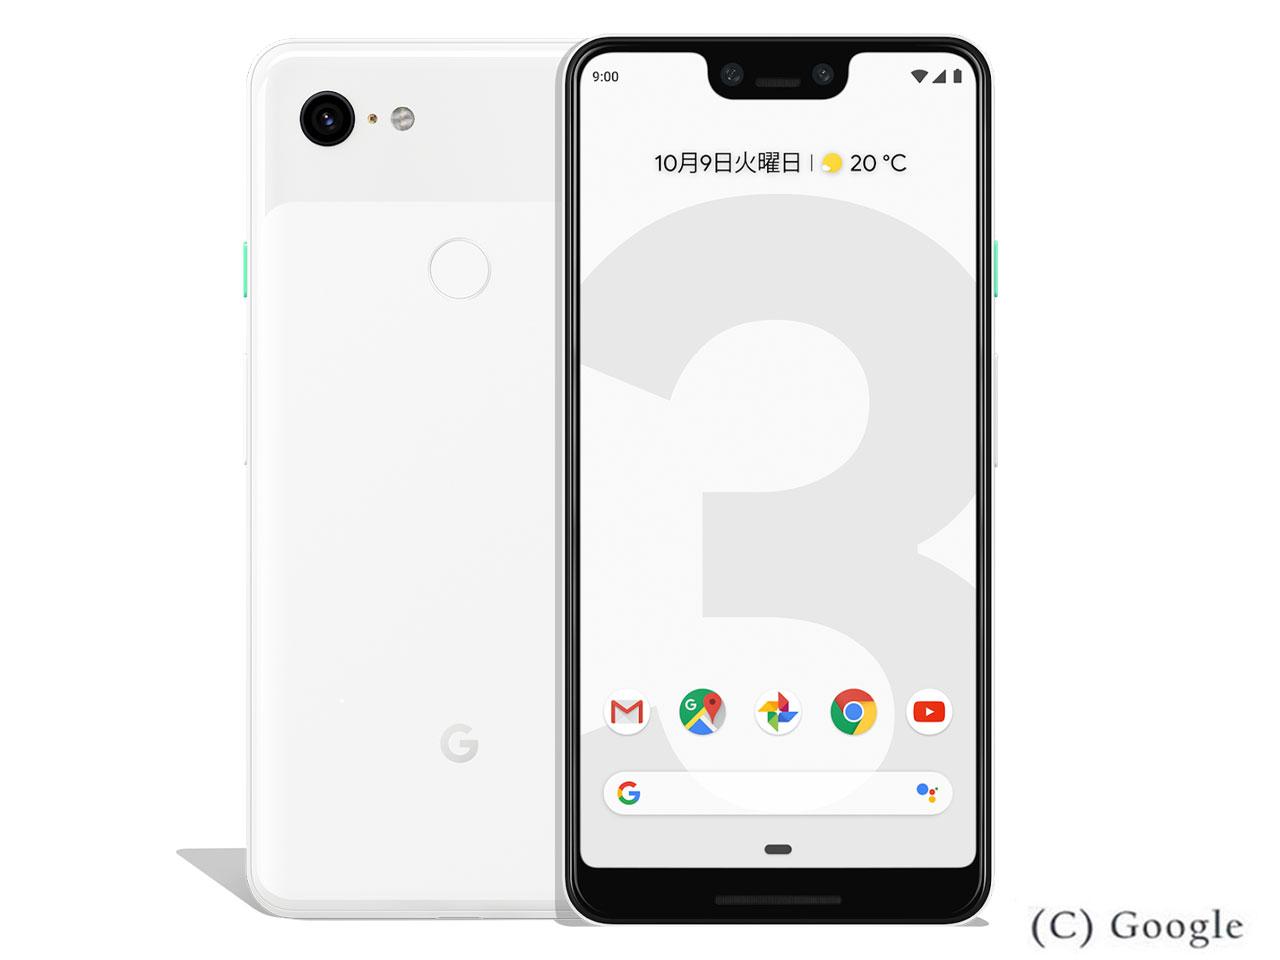 Google Pixel 3 XL 64GB SIMフリー [クリアリー ホワイト] の製品画像